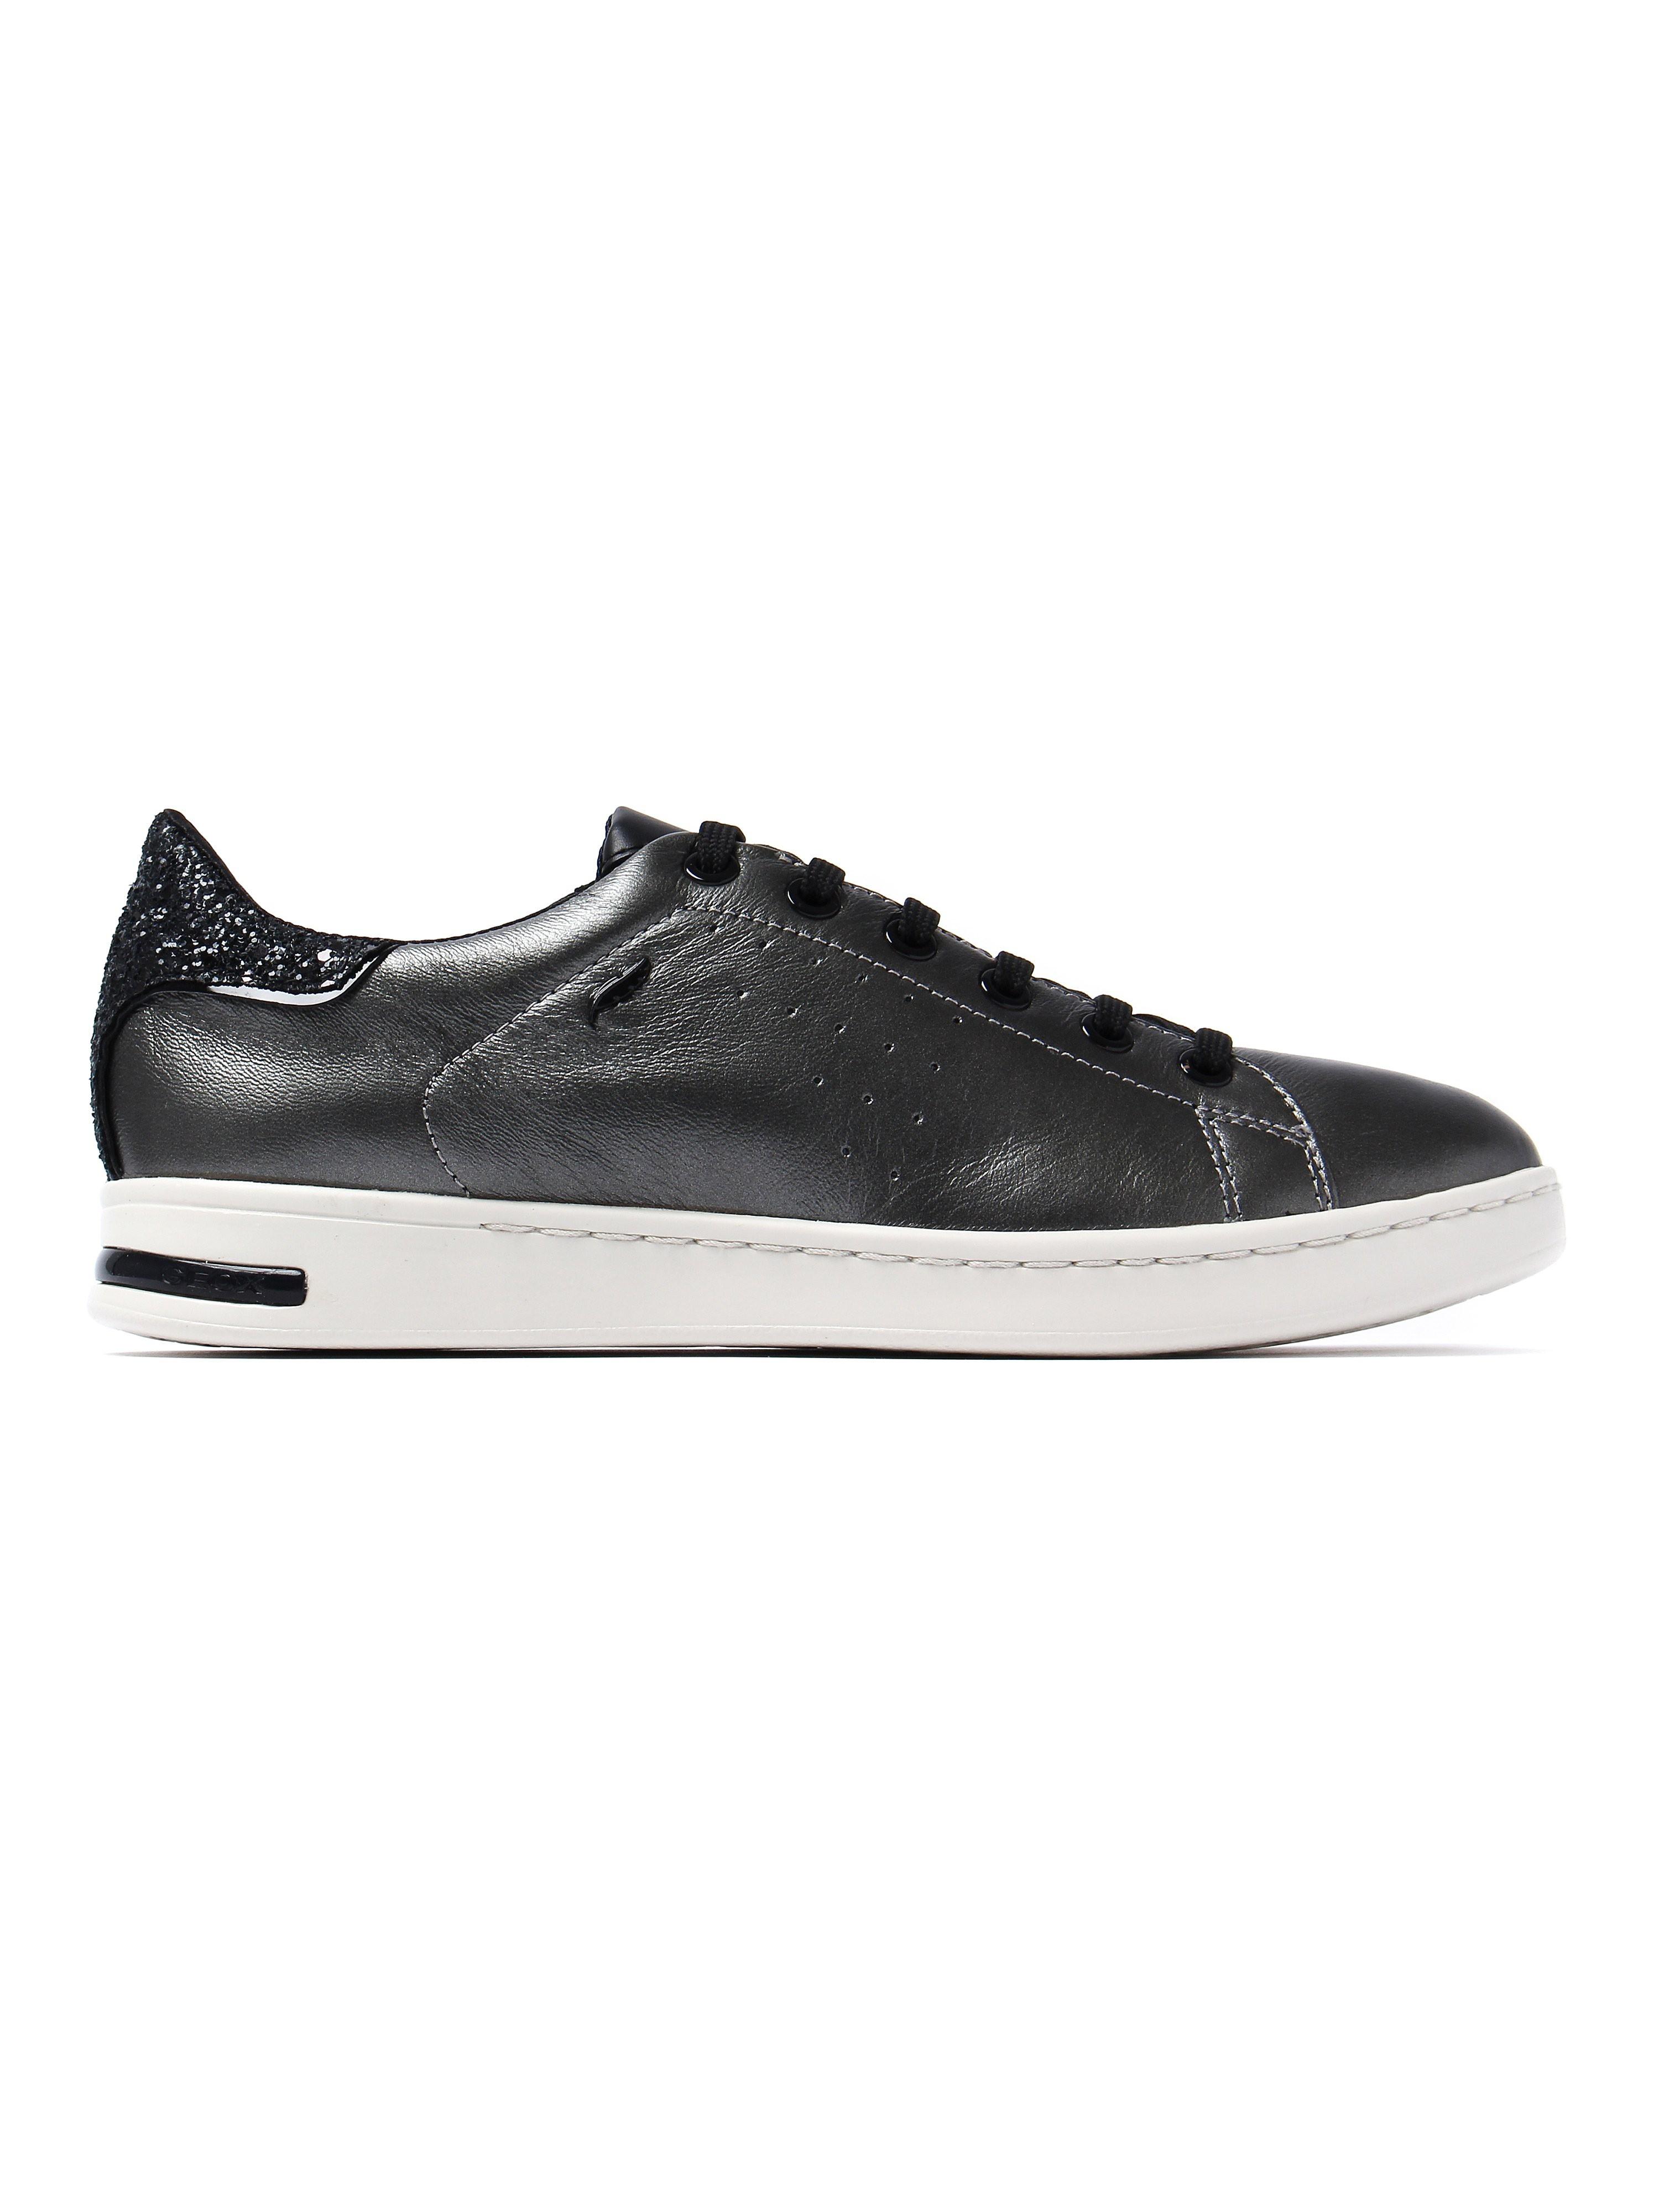 Geox Women's Jaysen Low Top Trainers - Dark Grey Leather